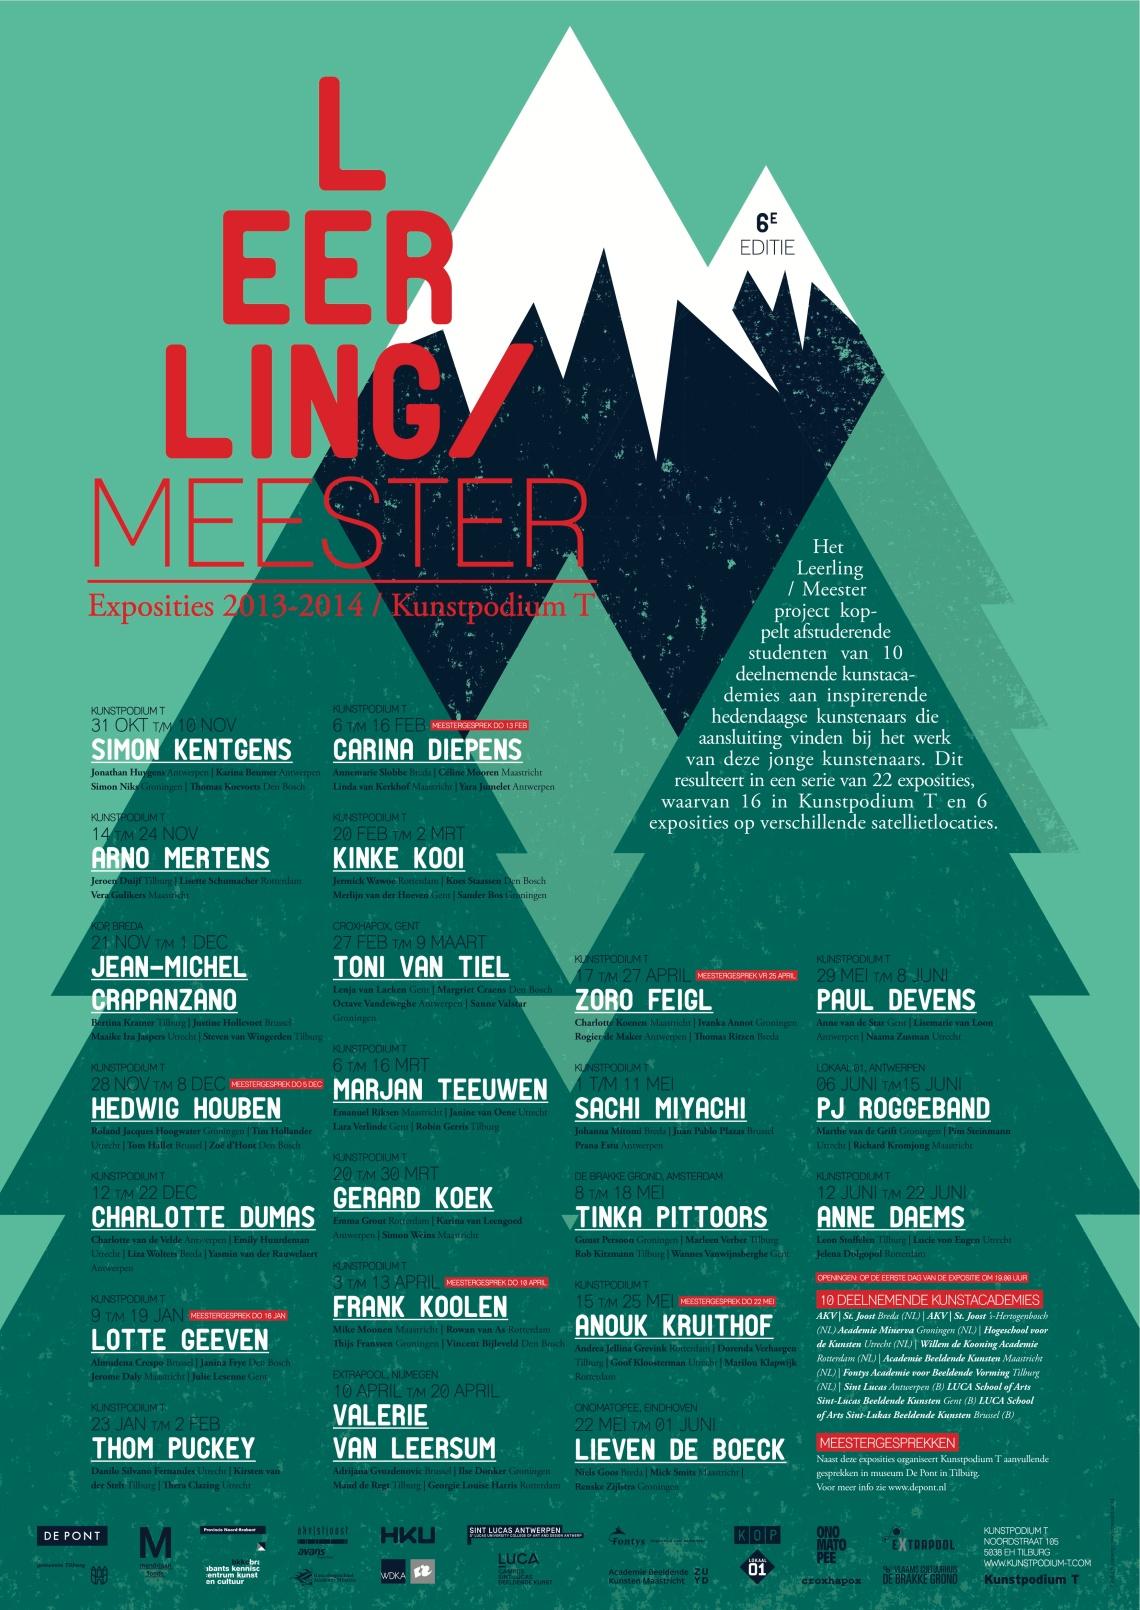 Poster LeerlingMeester 2013-2014